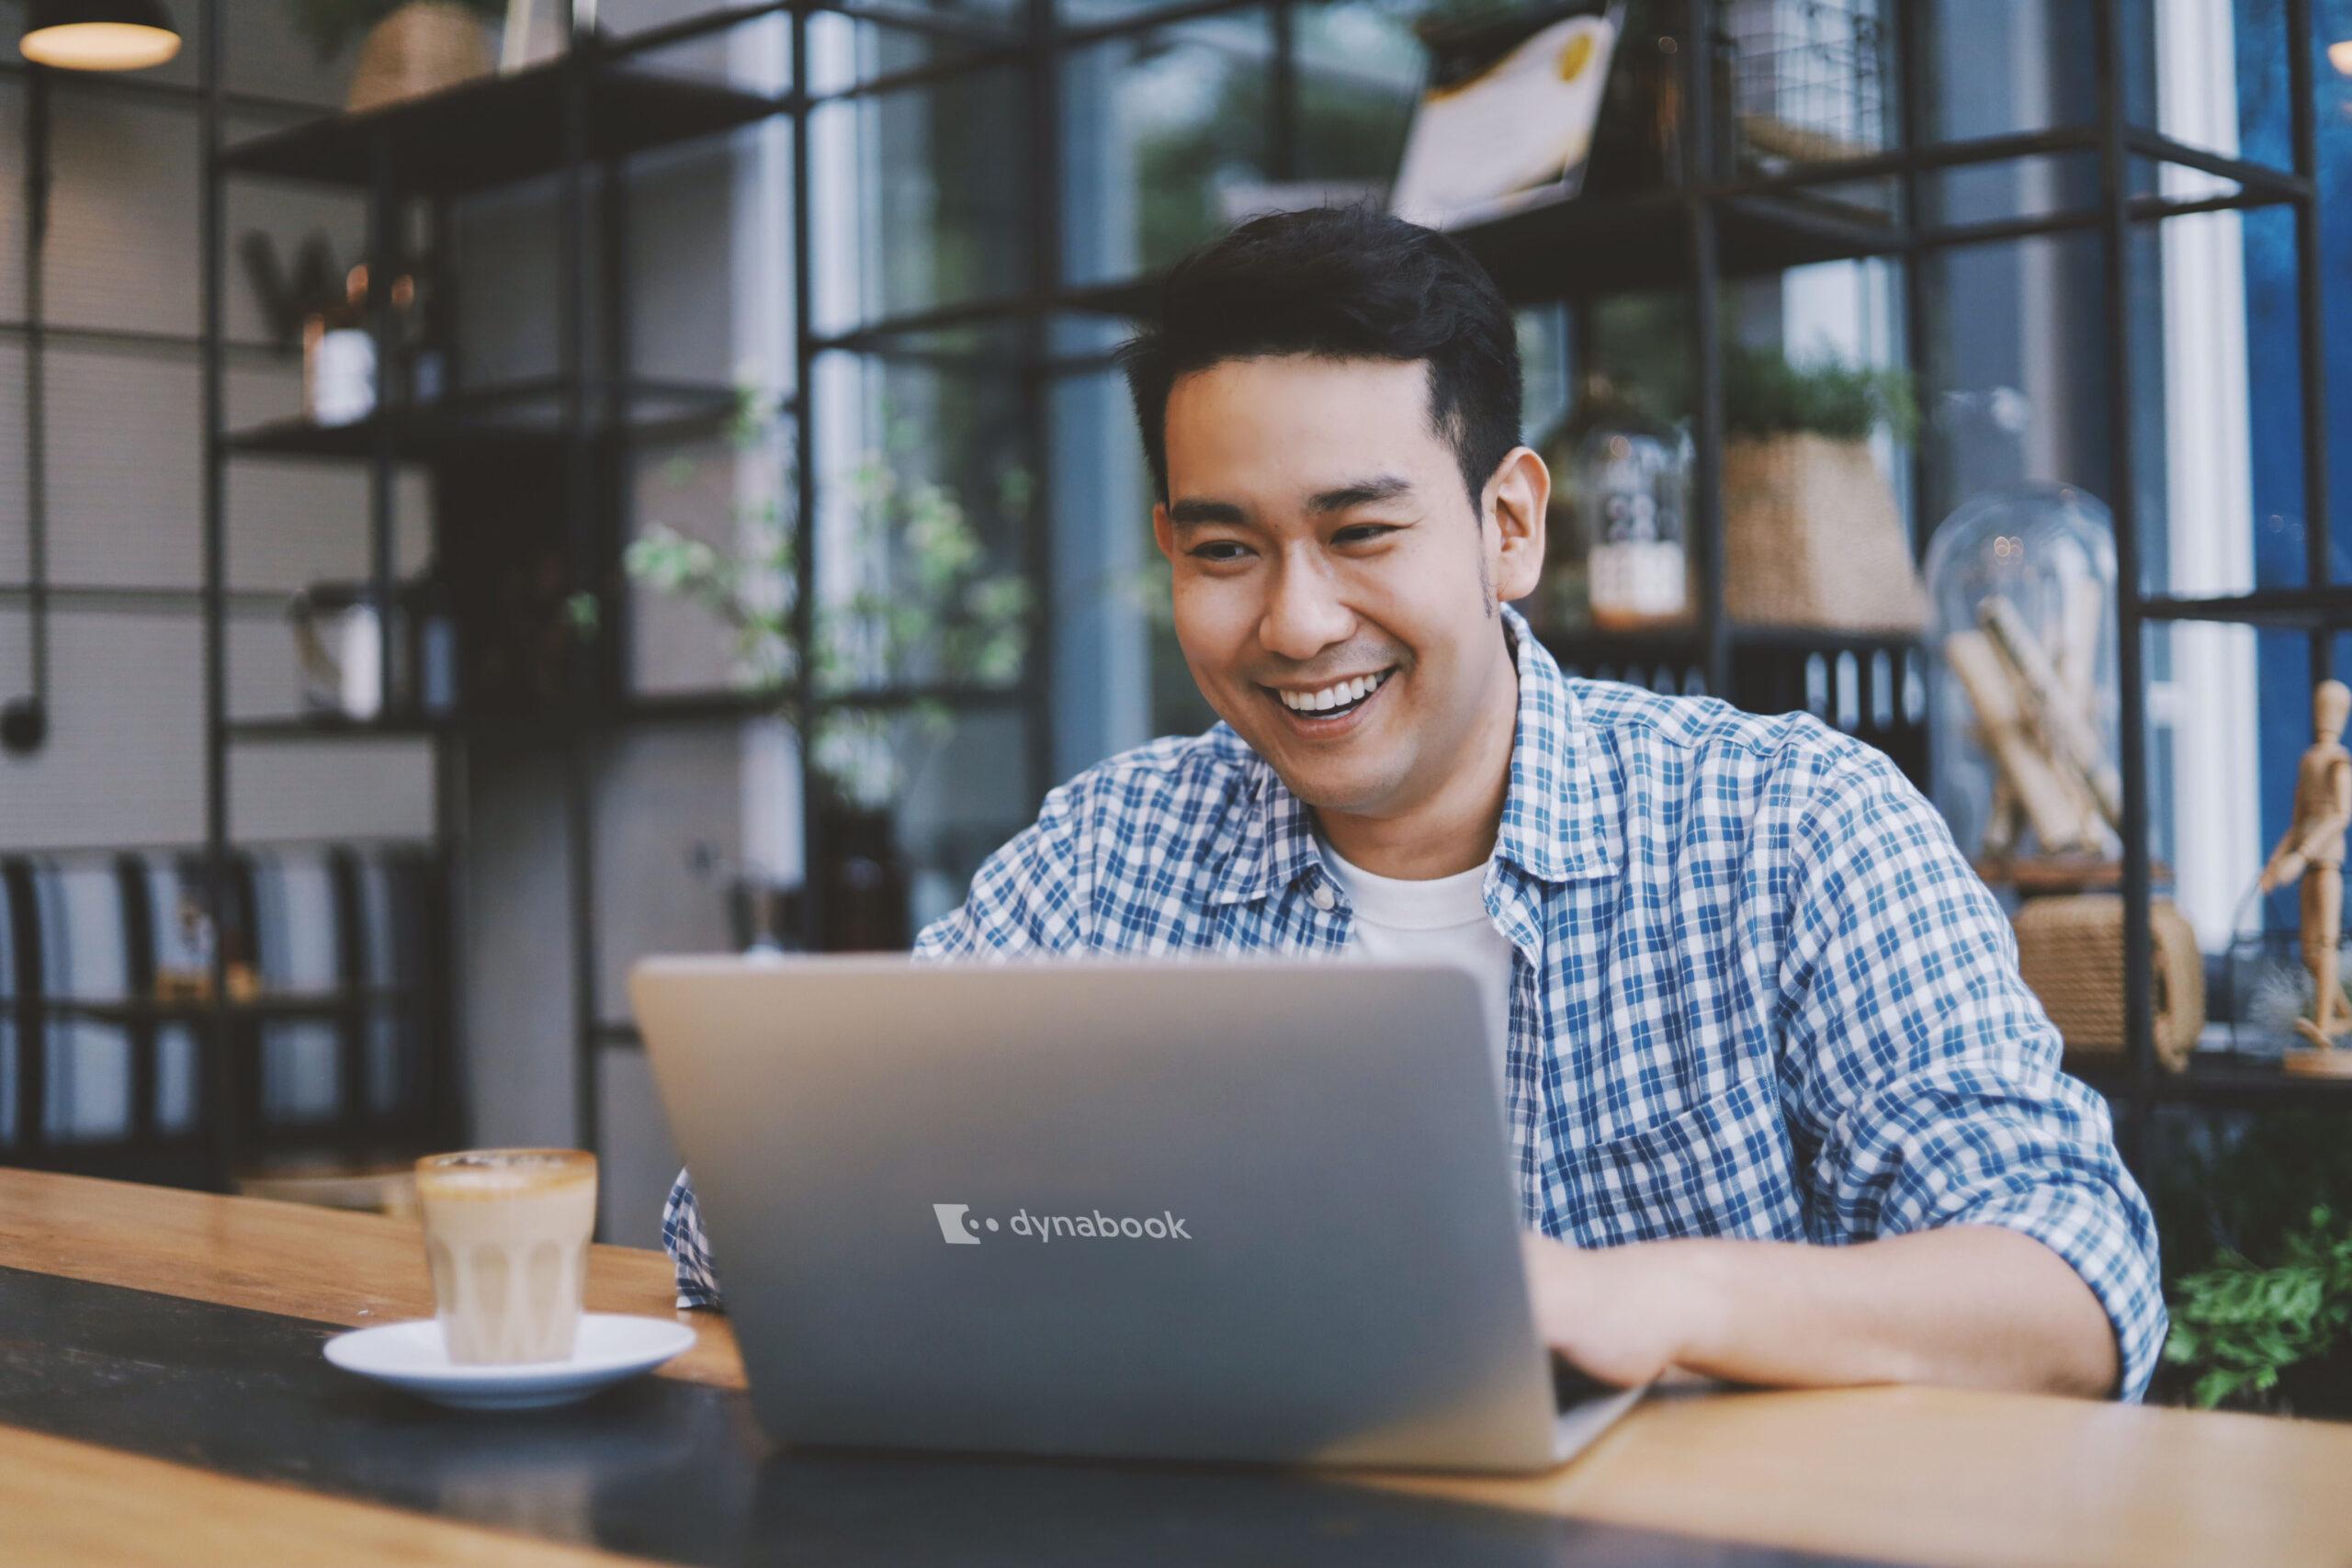 Resmi Akuisisi Dynabook, Sharp Indonesia Serius Garap Pasar Notebook Indonesia